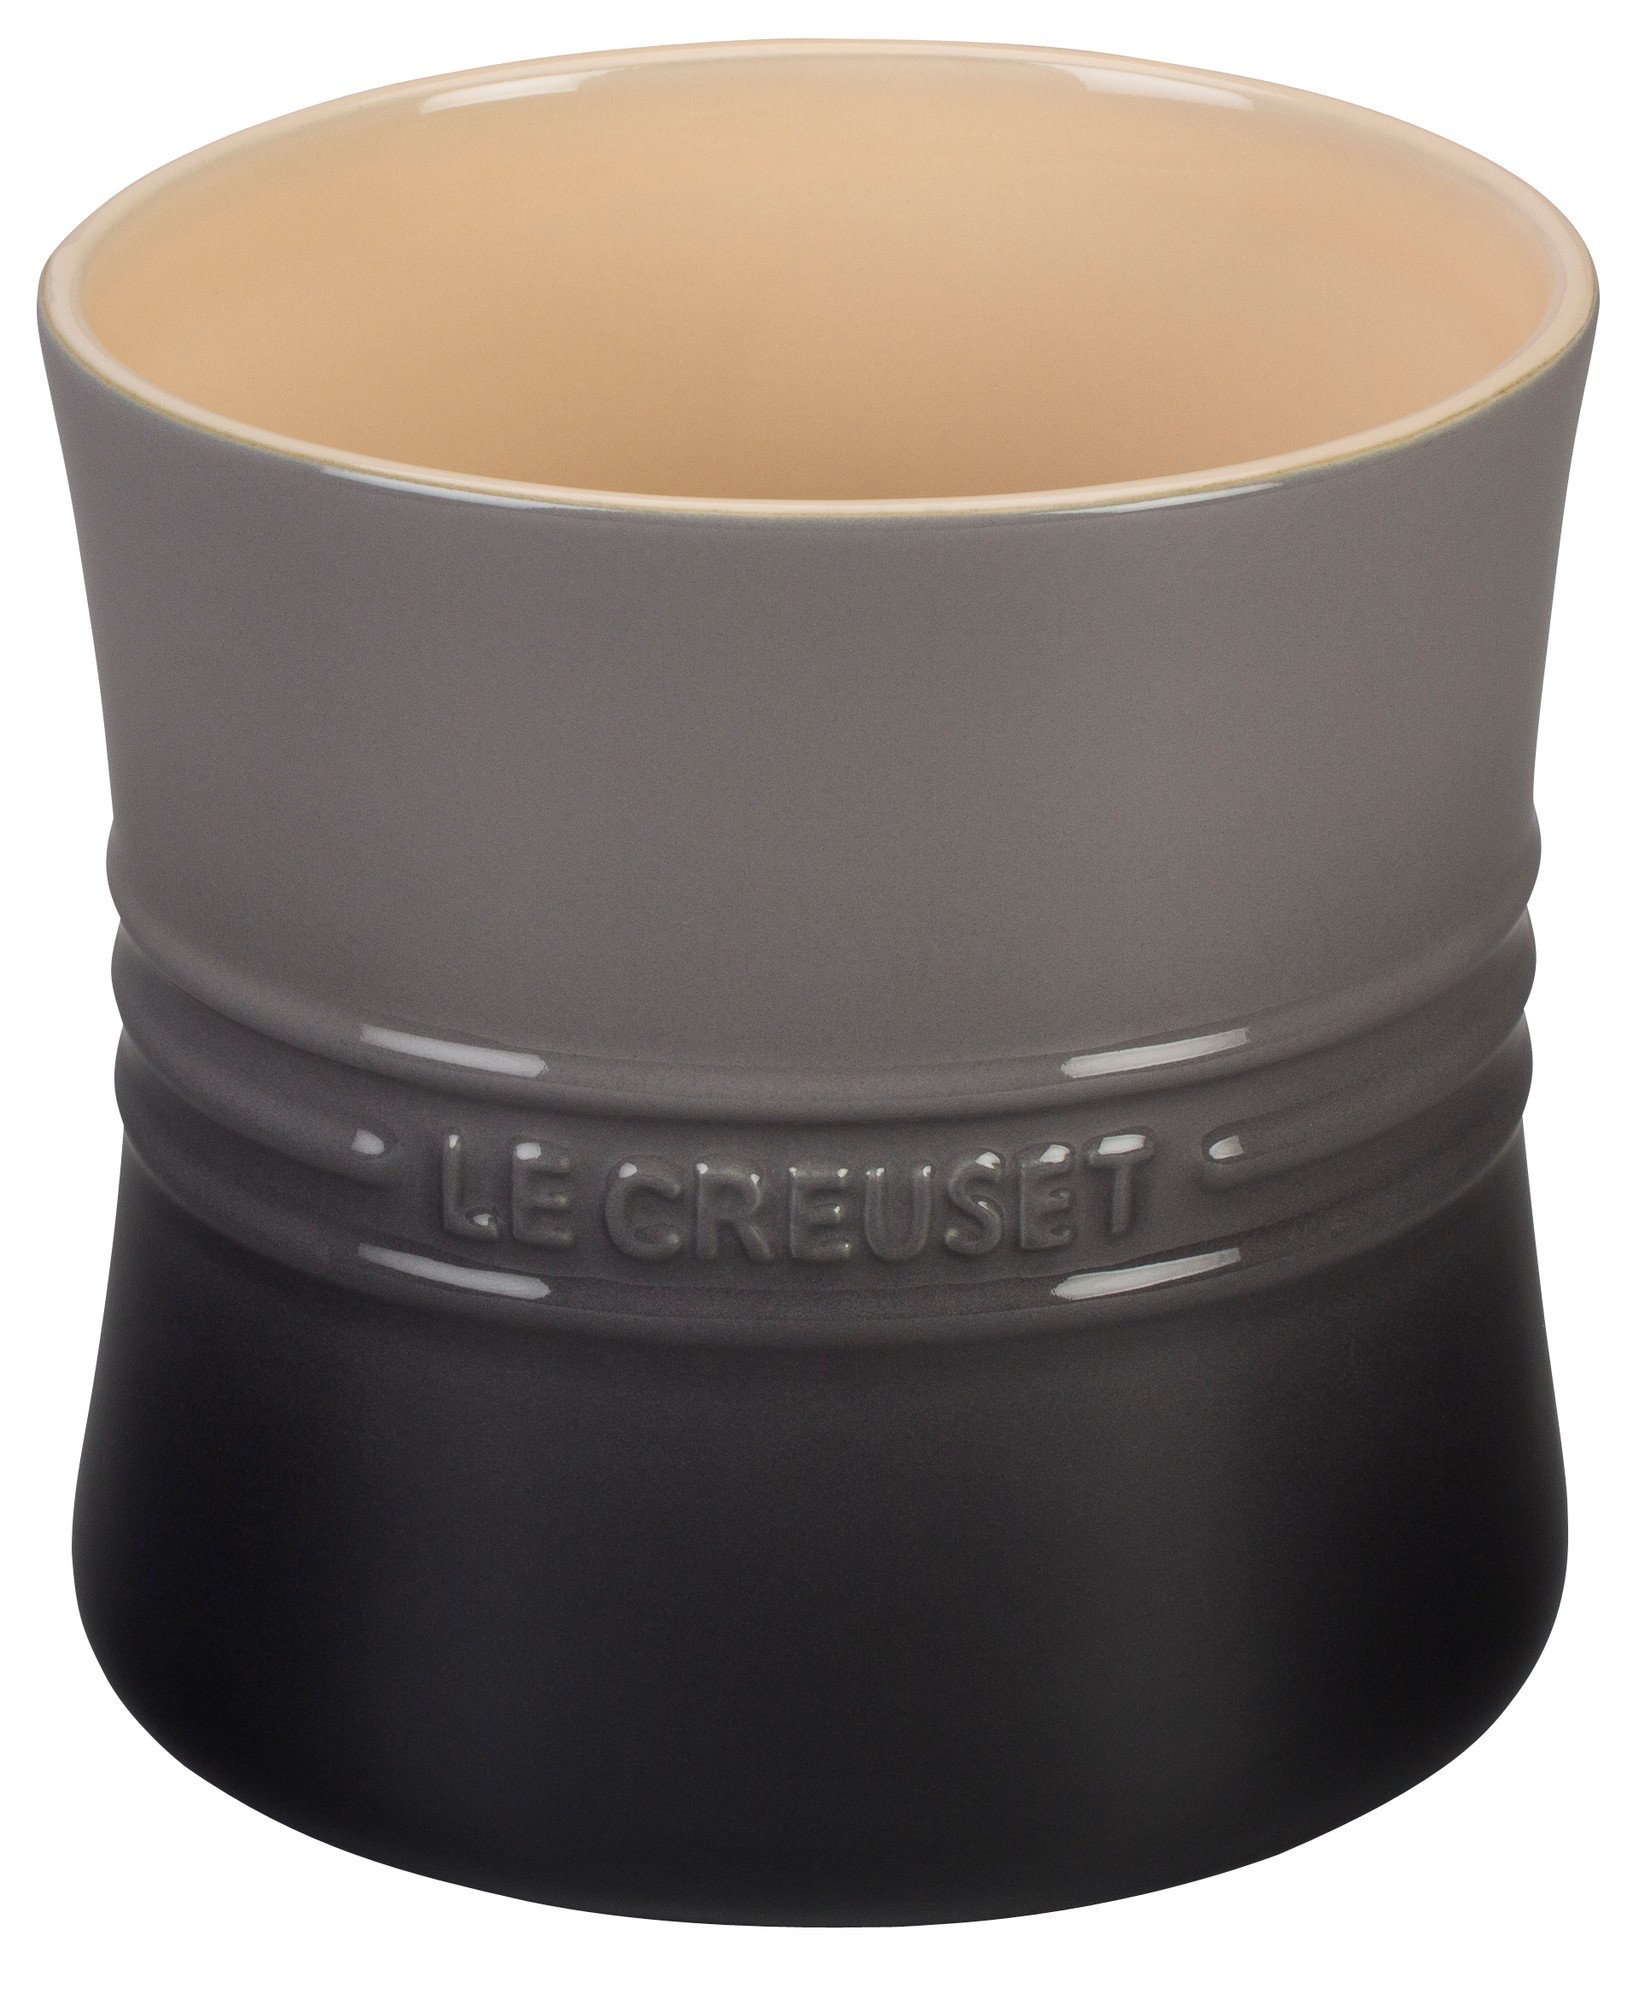 Le Creuset Stoneware 2 3/4-Quart Utensil Crock, Oyster